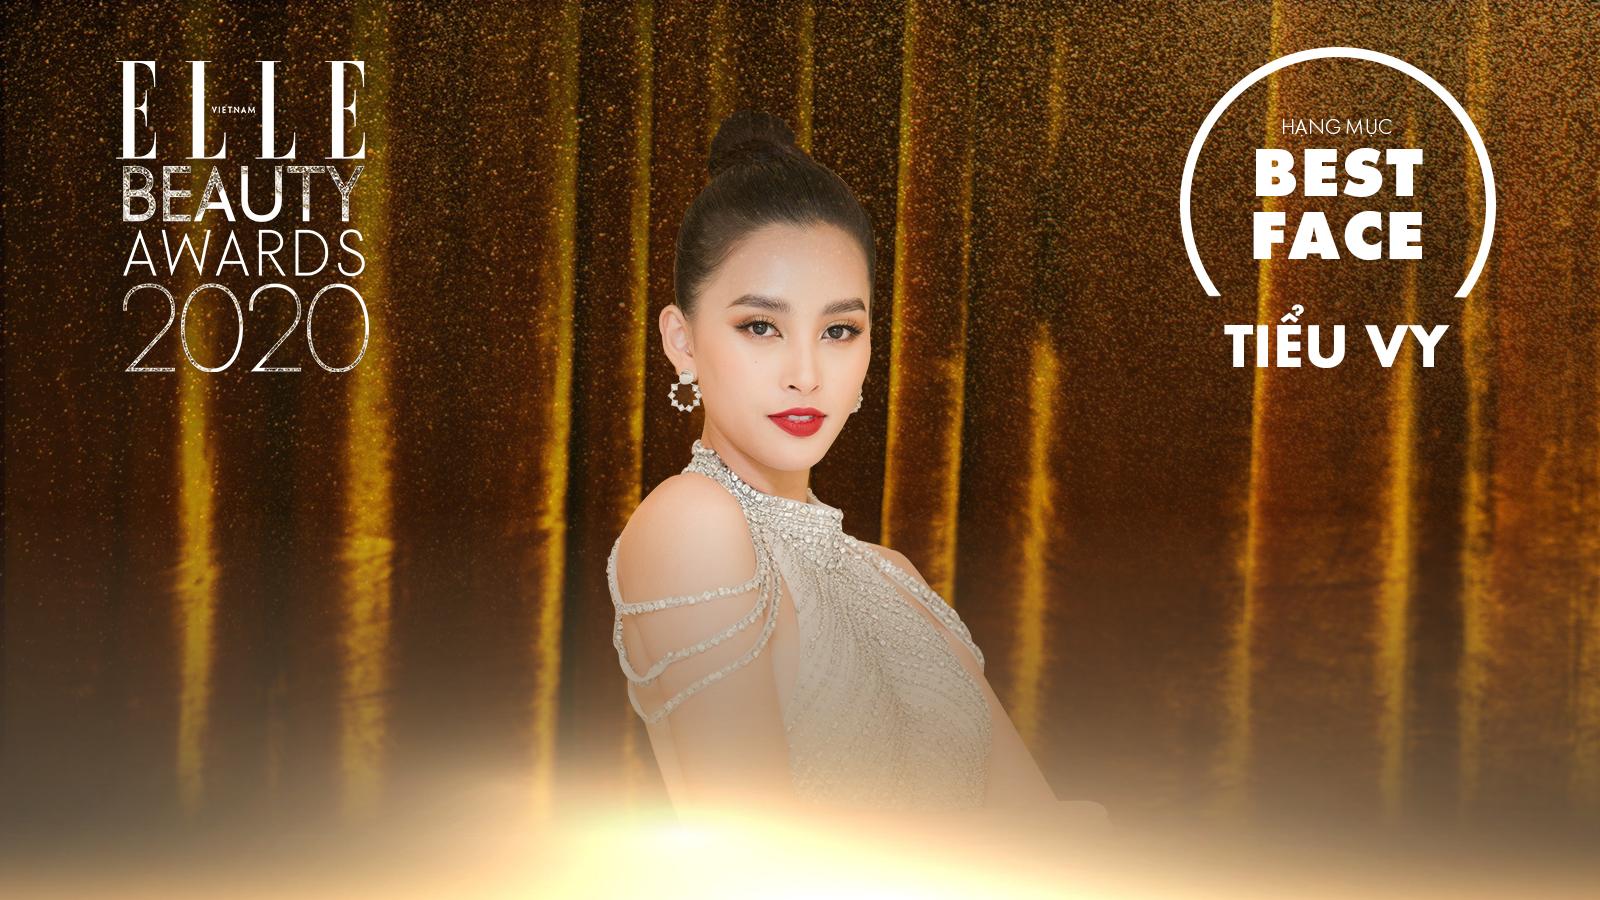 hoa hậu tiểu vy elle beauty awards 2020